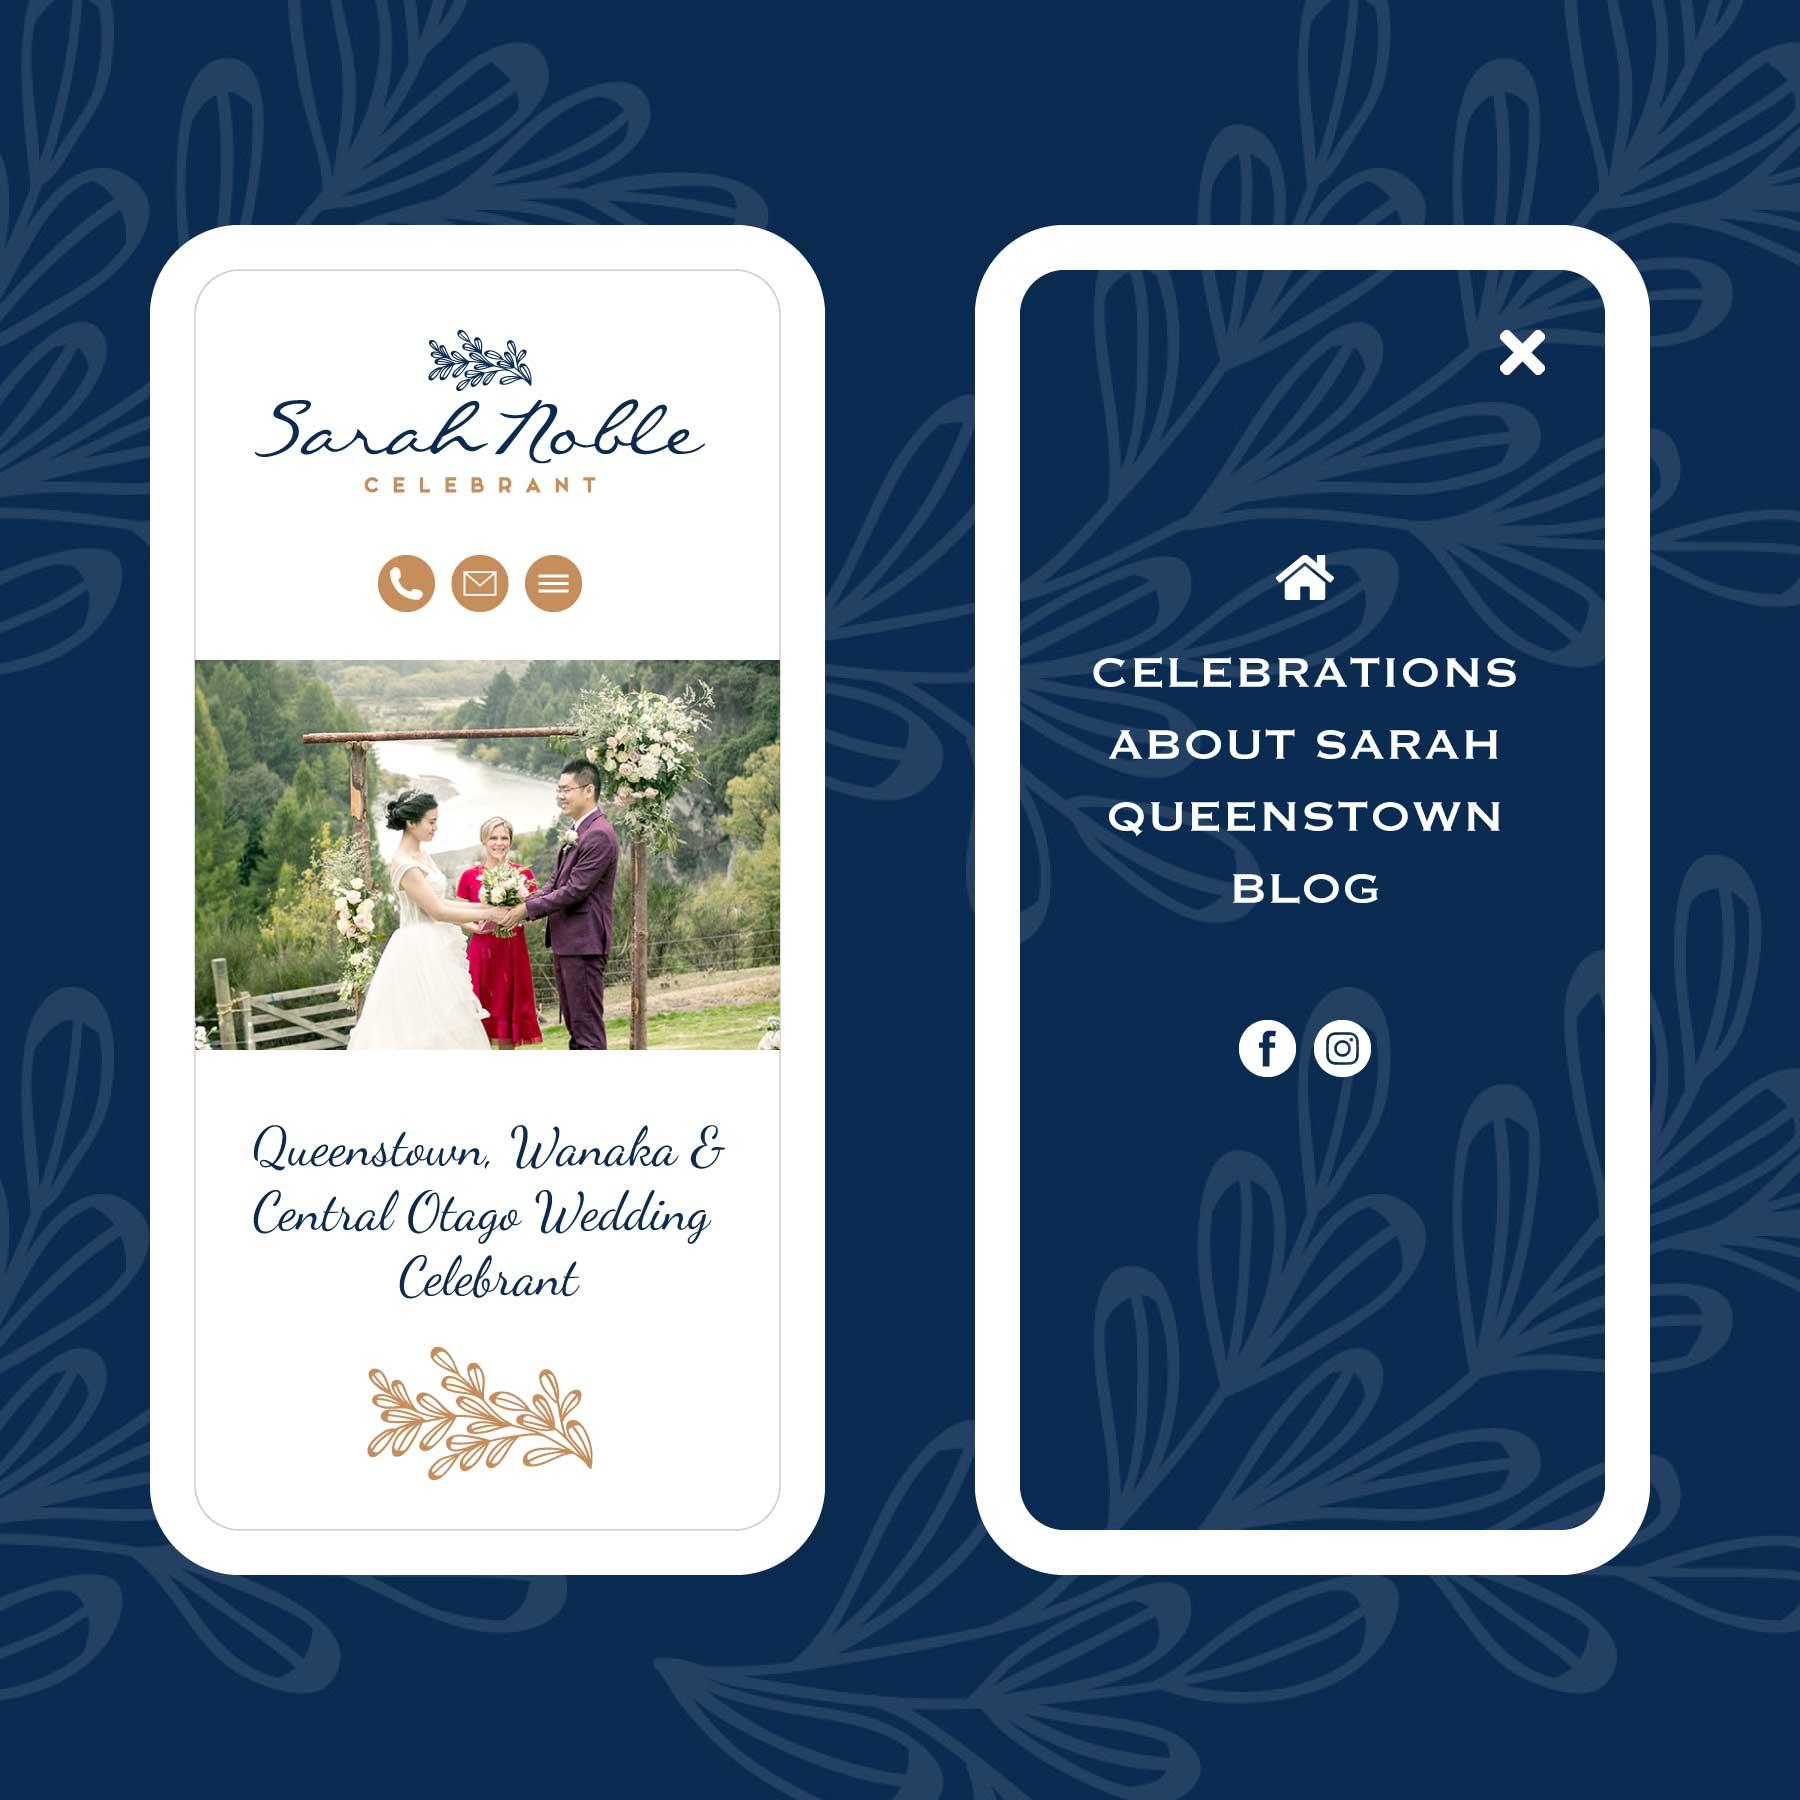 Sarah Noble Marriage Celebrant Invercargill Web Design